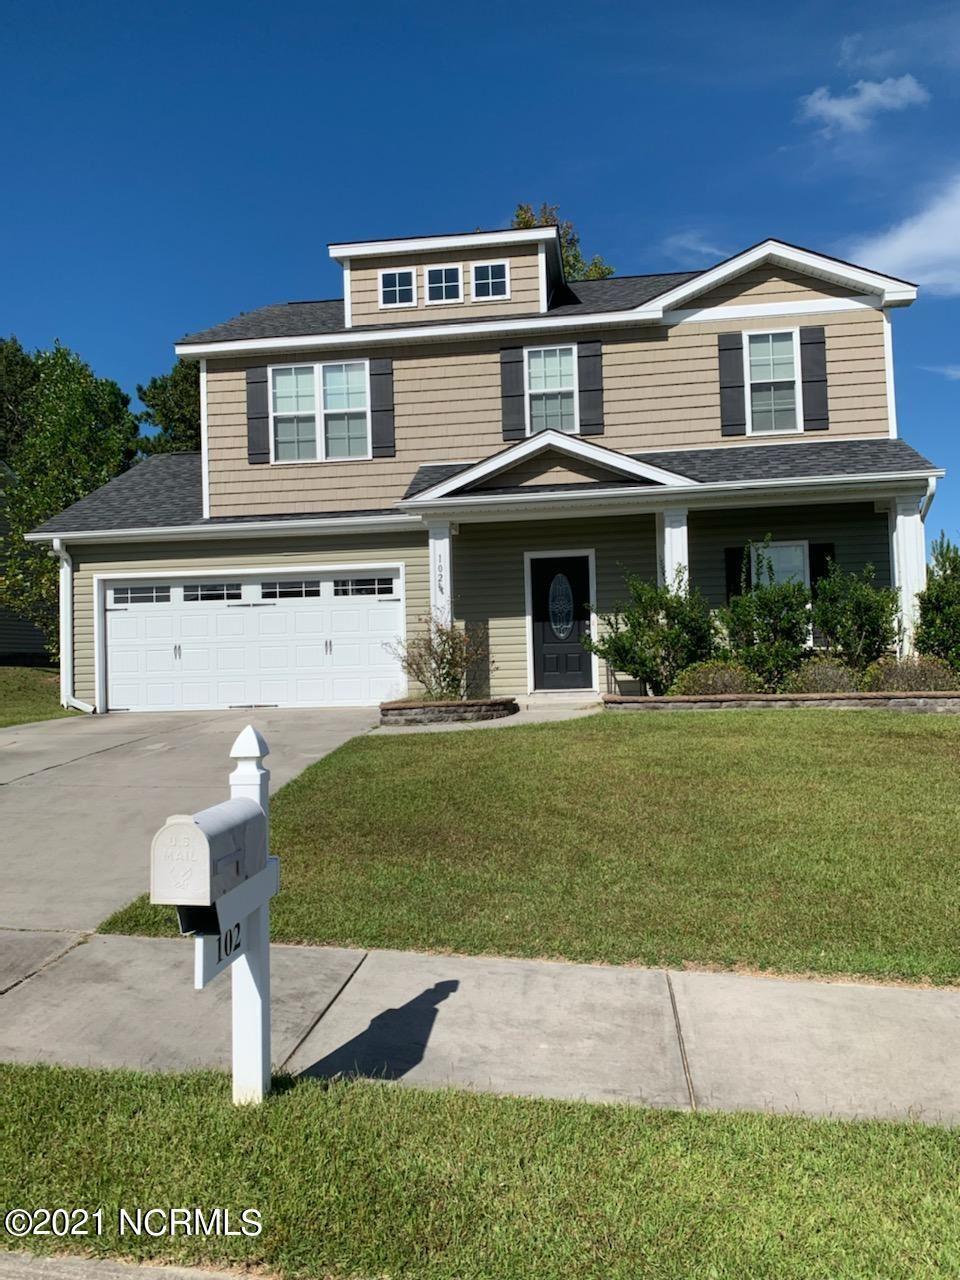 Photo of 102 Tupelo Court, Jacksonville, NC 28546 (MLS # 100293637)